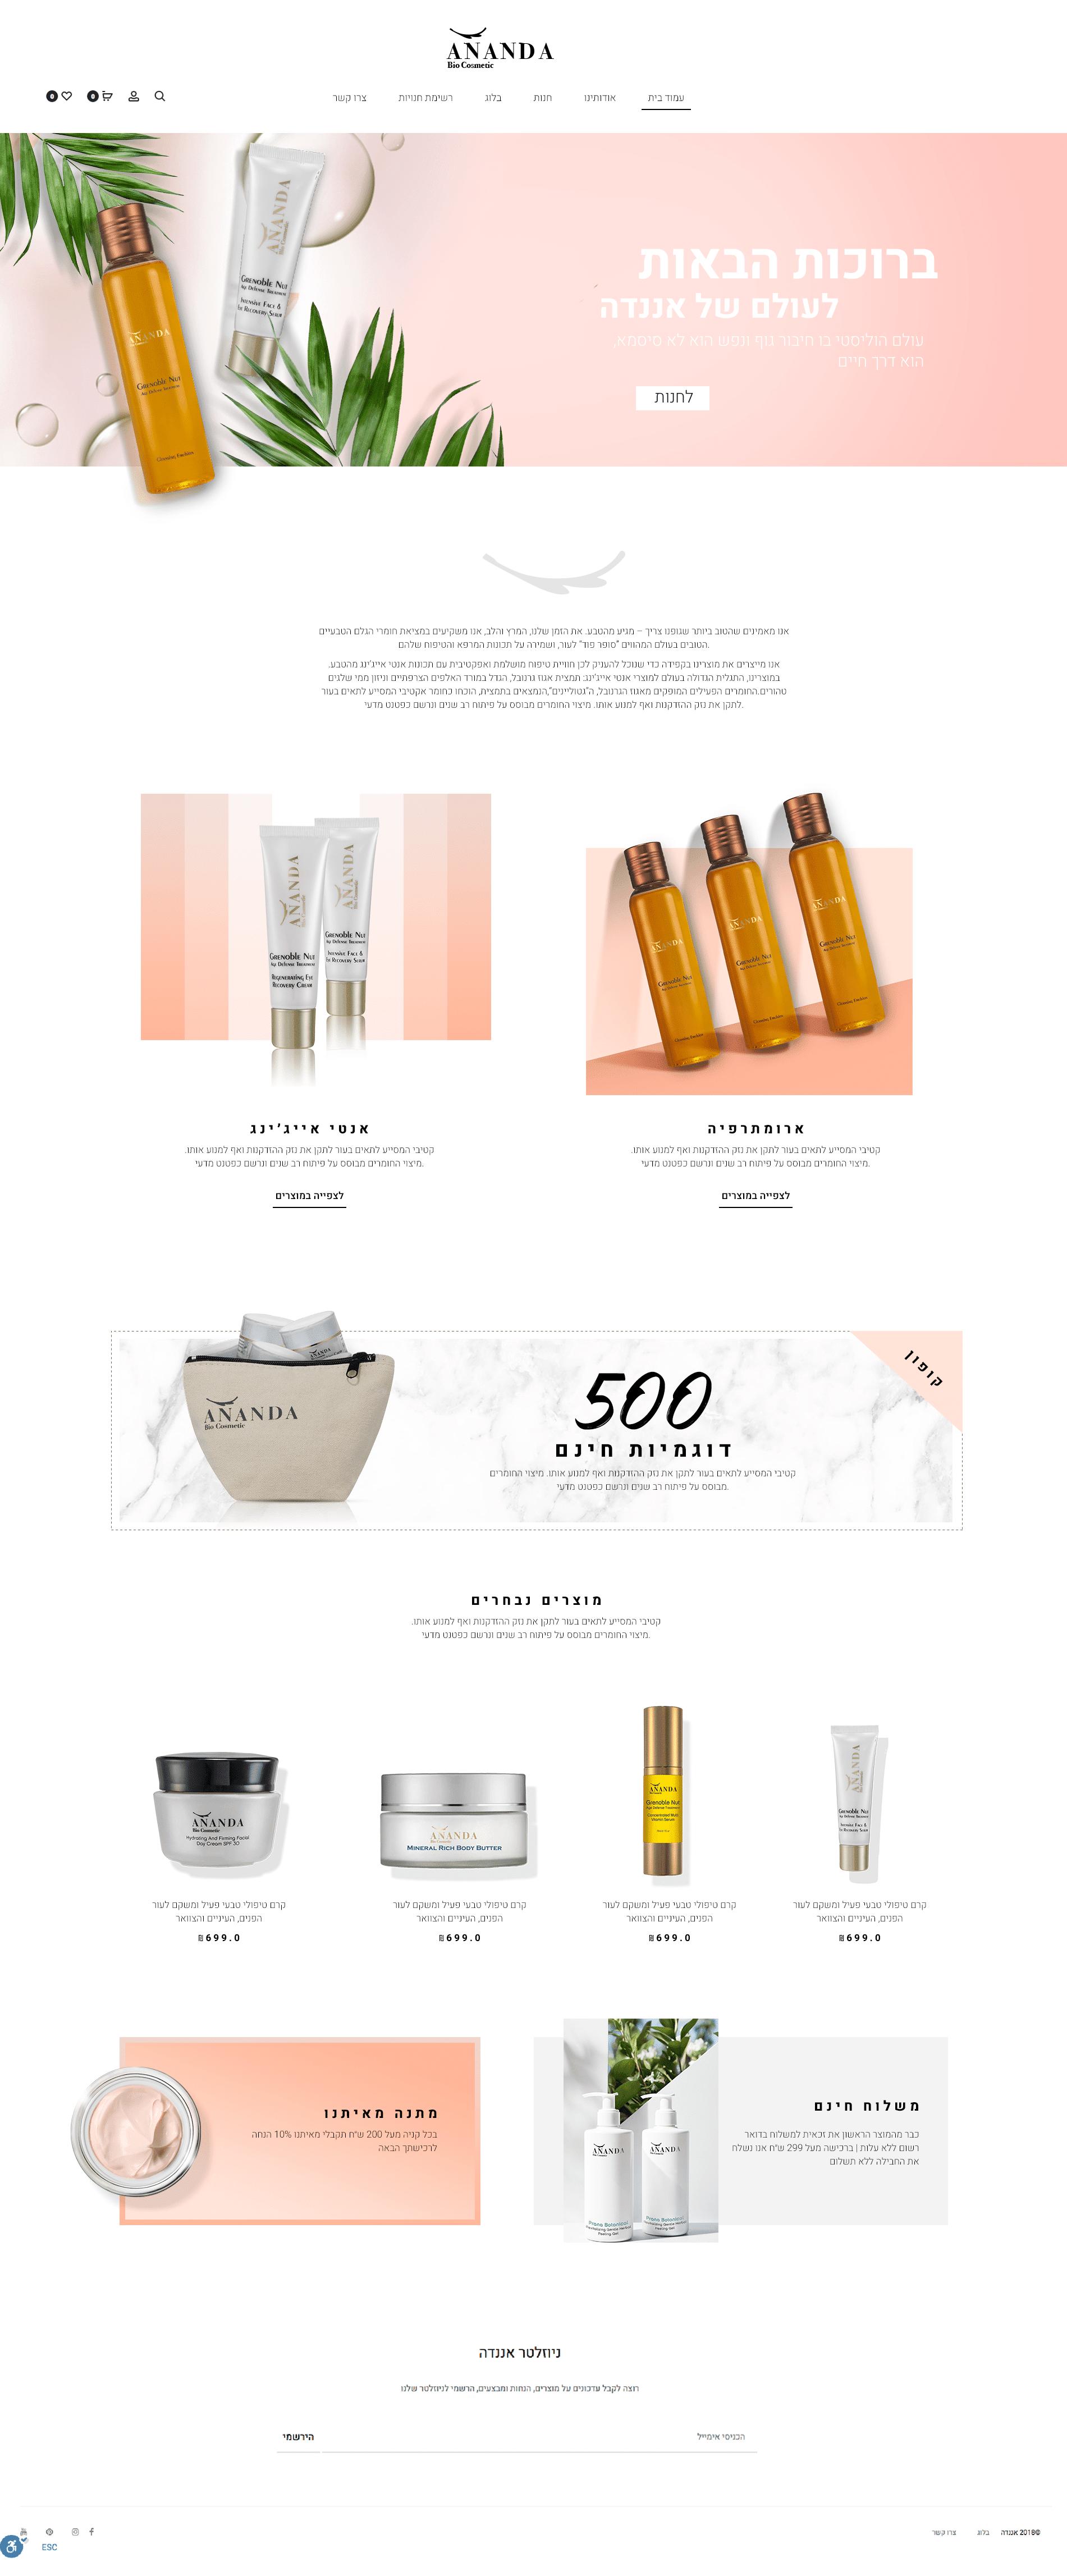 Ananda Website